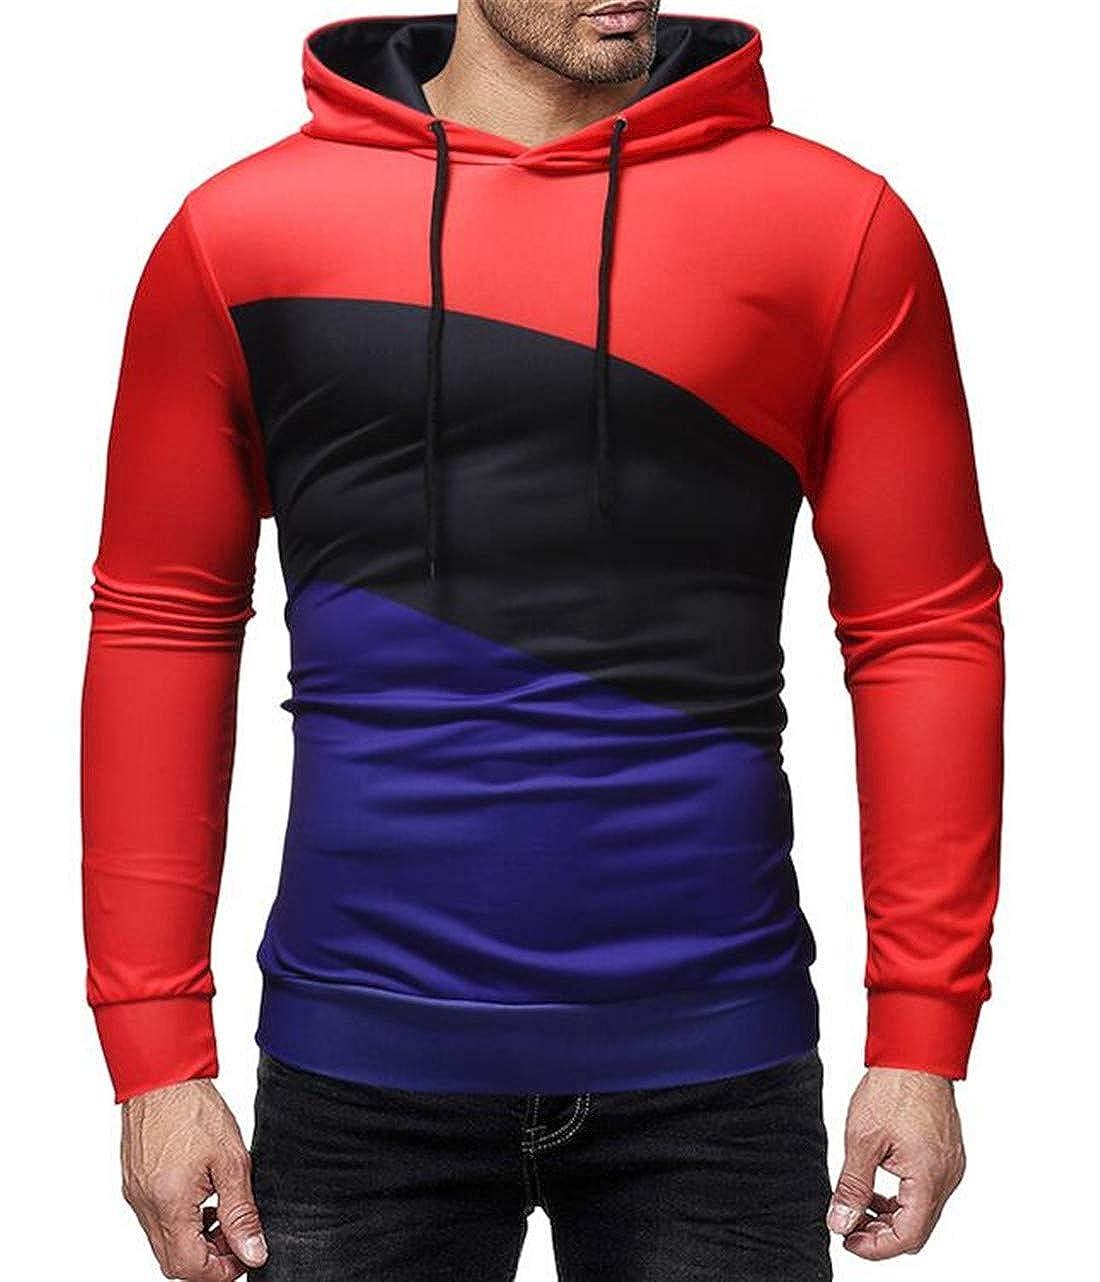 UUYUK Men Winter Slim Fit Contrast Color Pullover Hooded Sweatshirt